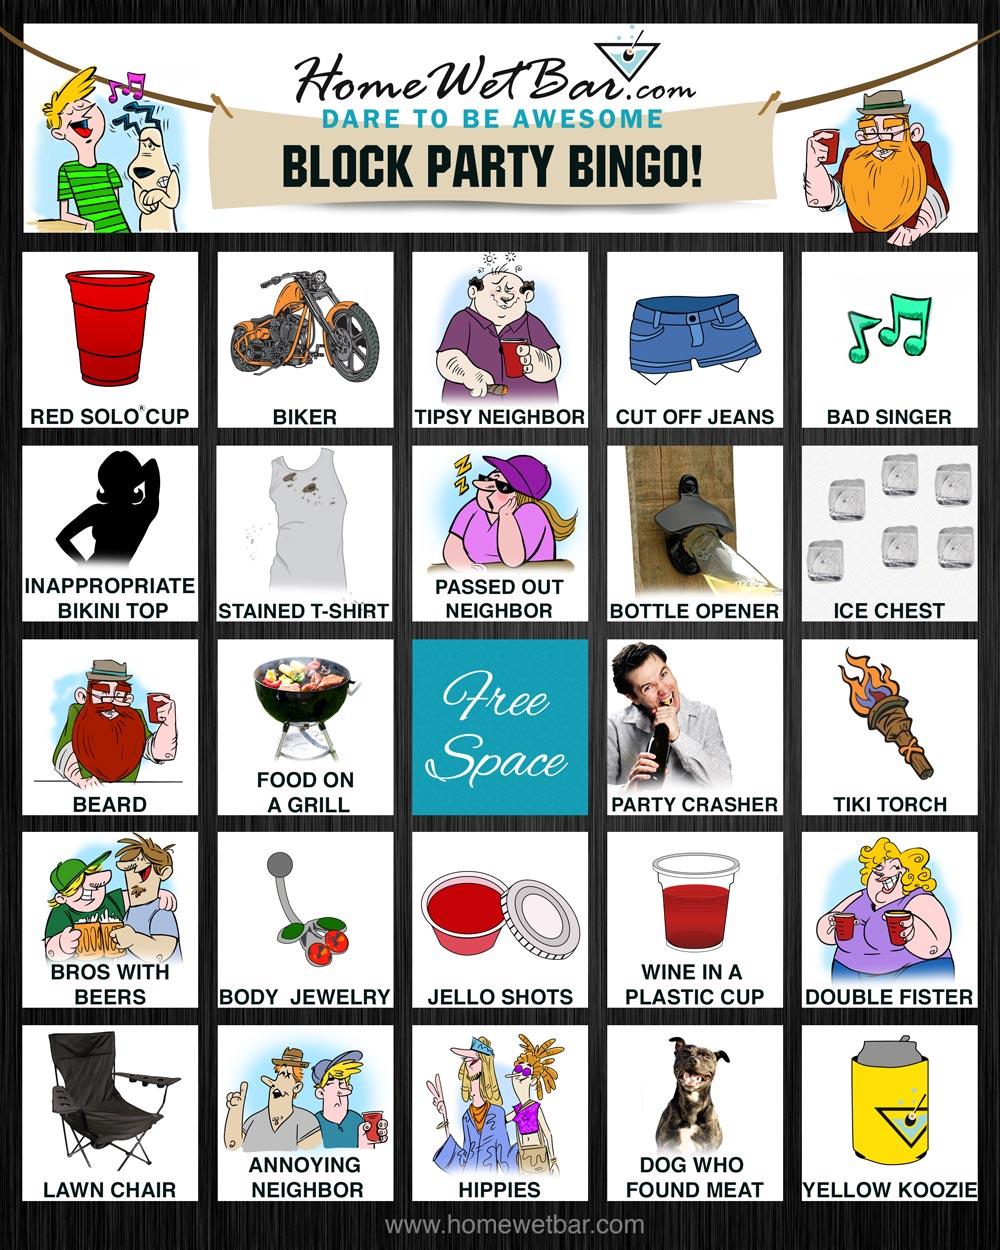 8. Tailgate Bingo